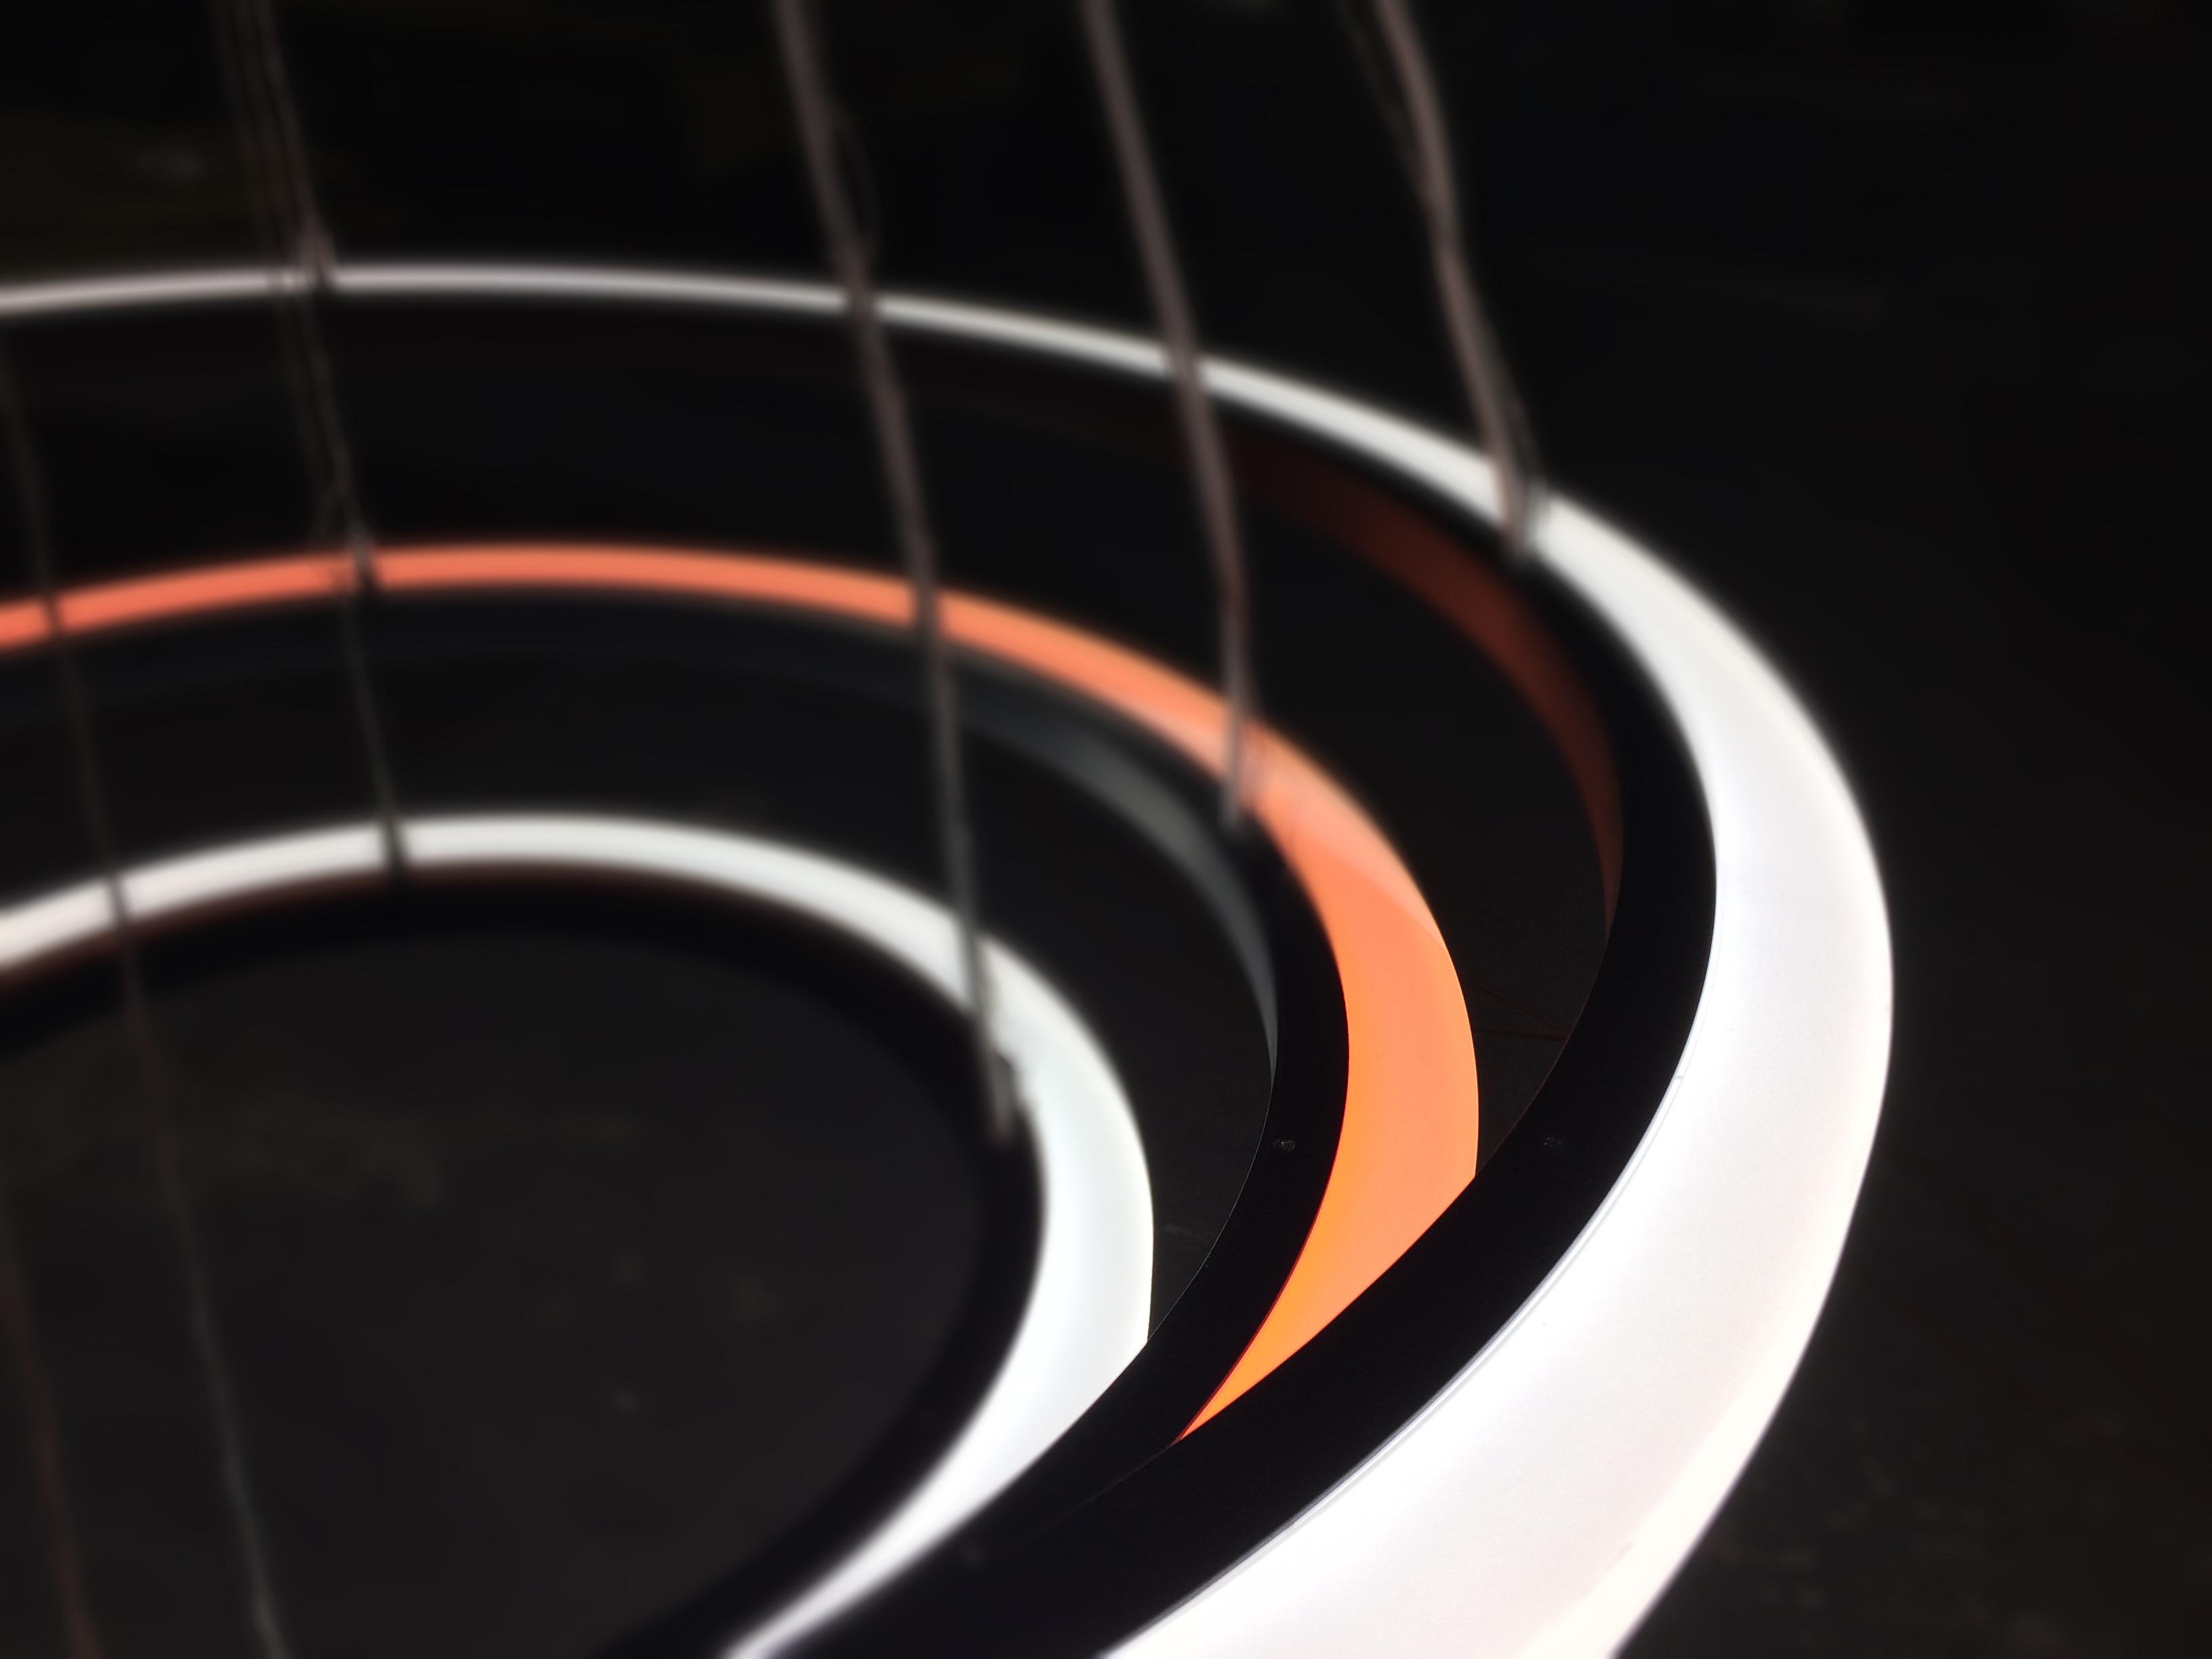 Acrylic Ring LED Light_back_1000+800+600_NEONNY